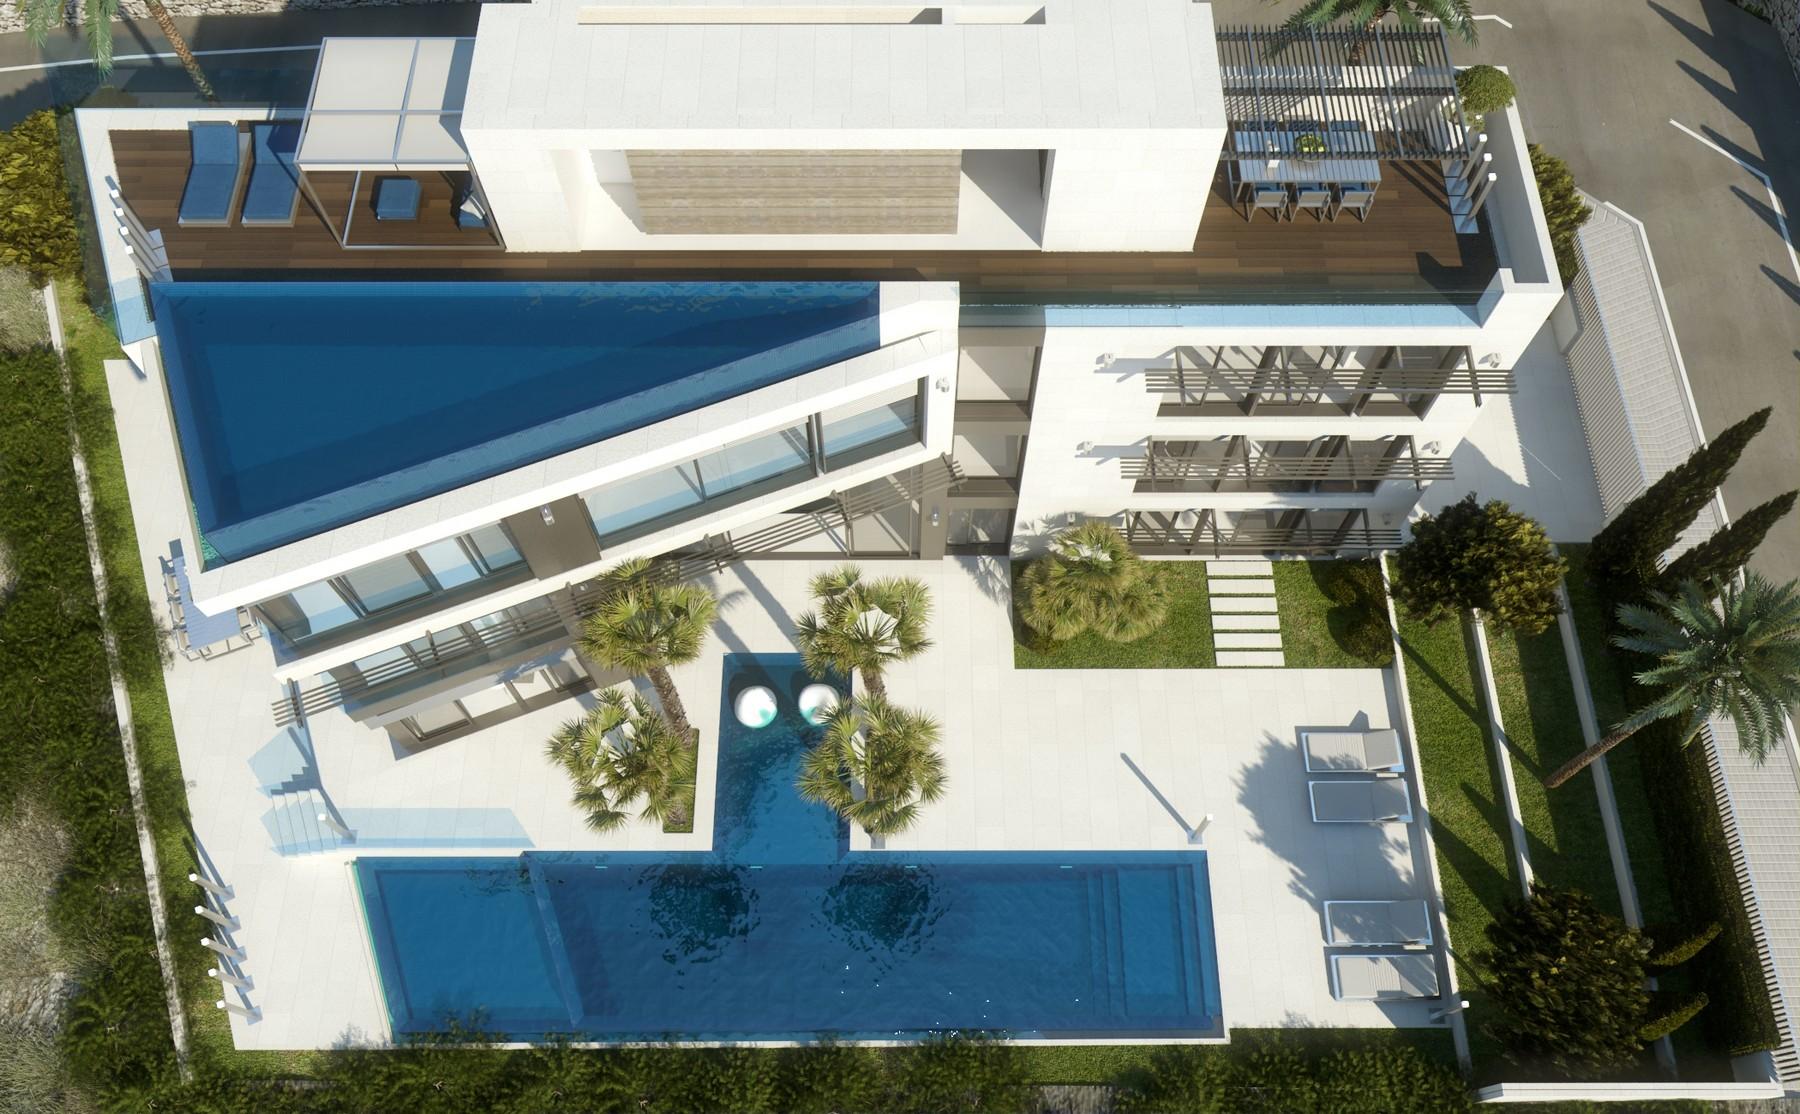 公寓 为 销售 在 Penthouse with sea view in Porto Cristo Porto Cristo, 马洛卡 07680 西班牙